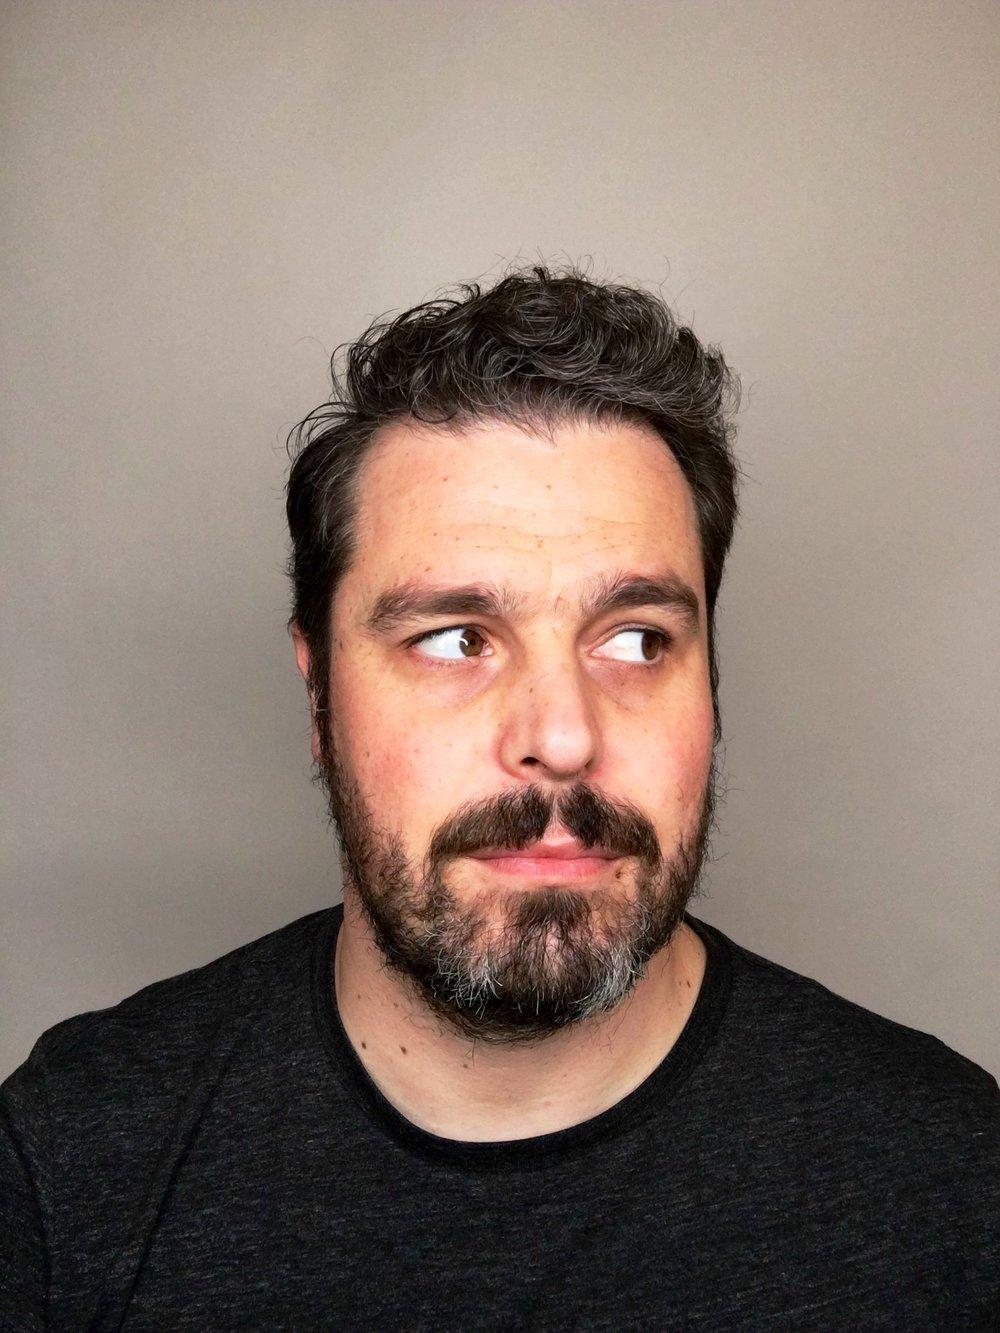 Wayne, Tech Director